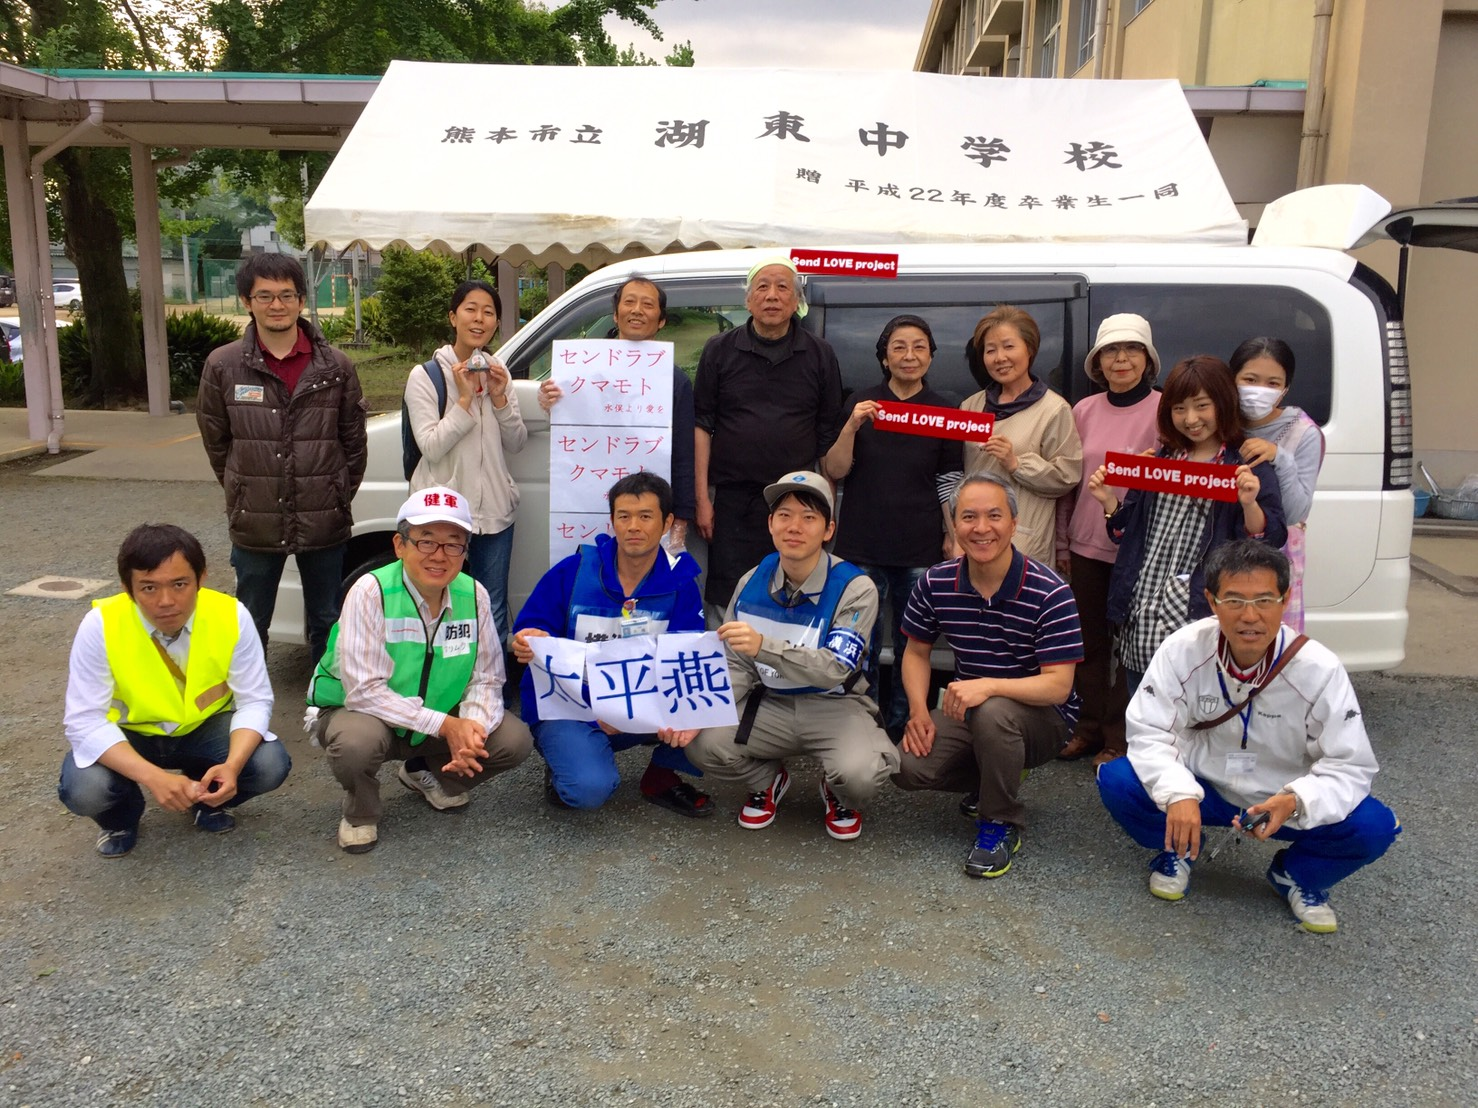 http://www.kickbackcafe.jp/support2/report/S__4710413.jpg